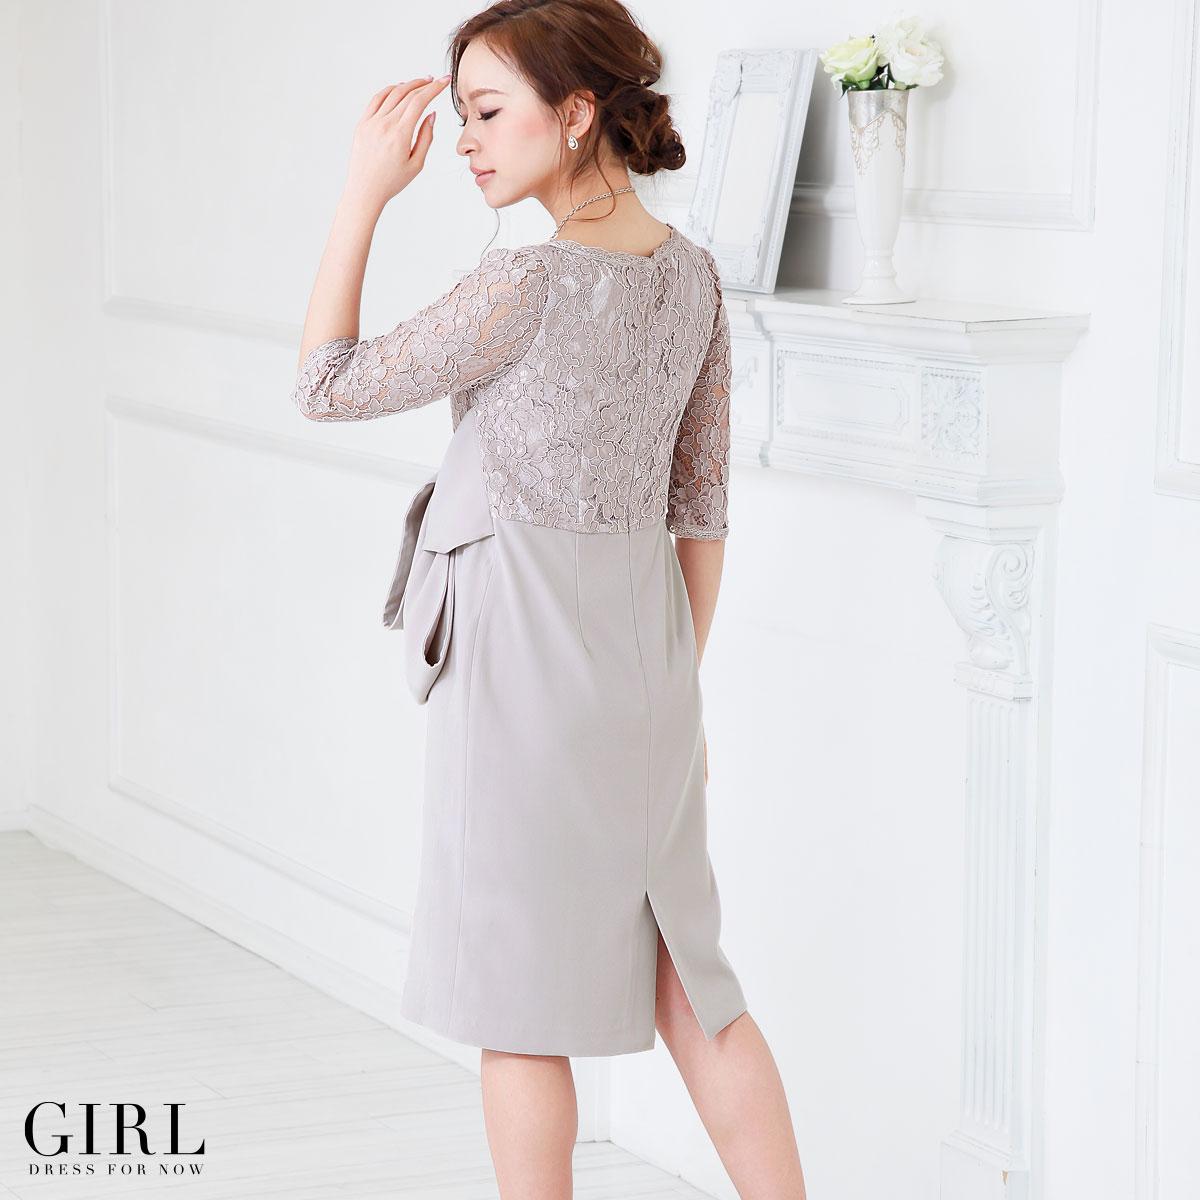 Dress Shop GIRL: The Half-length Sleeve Adult Lace Ribbon